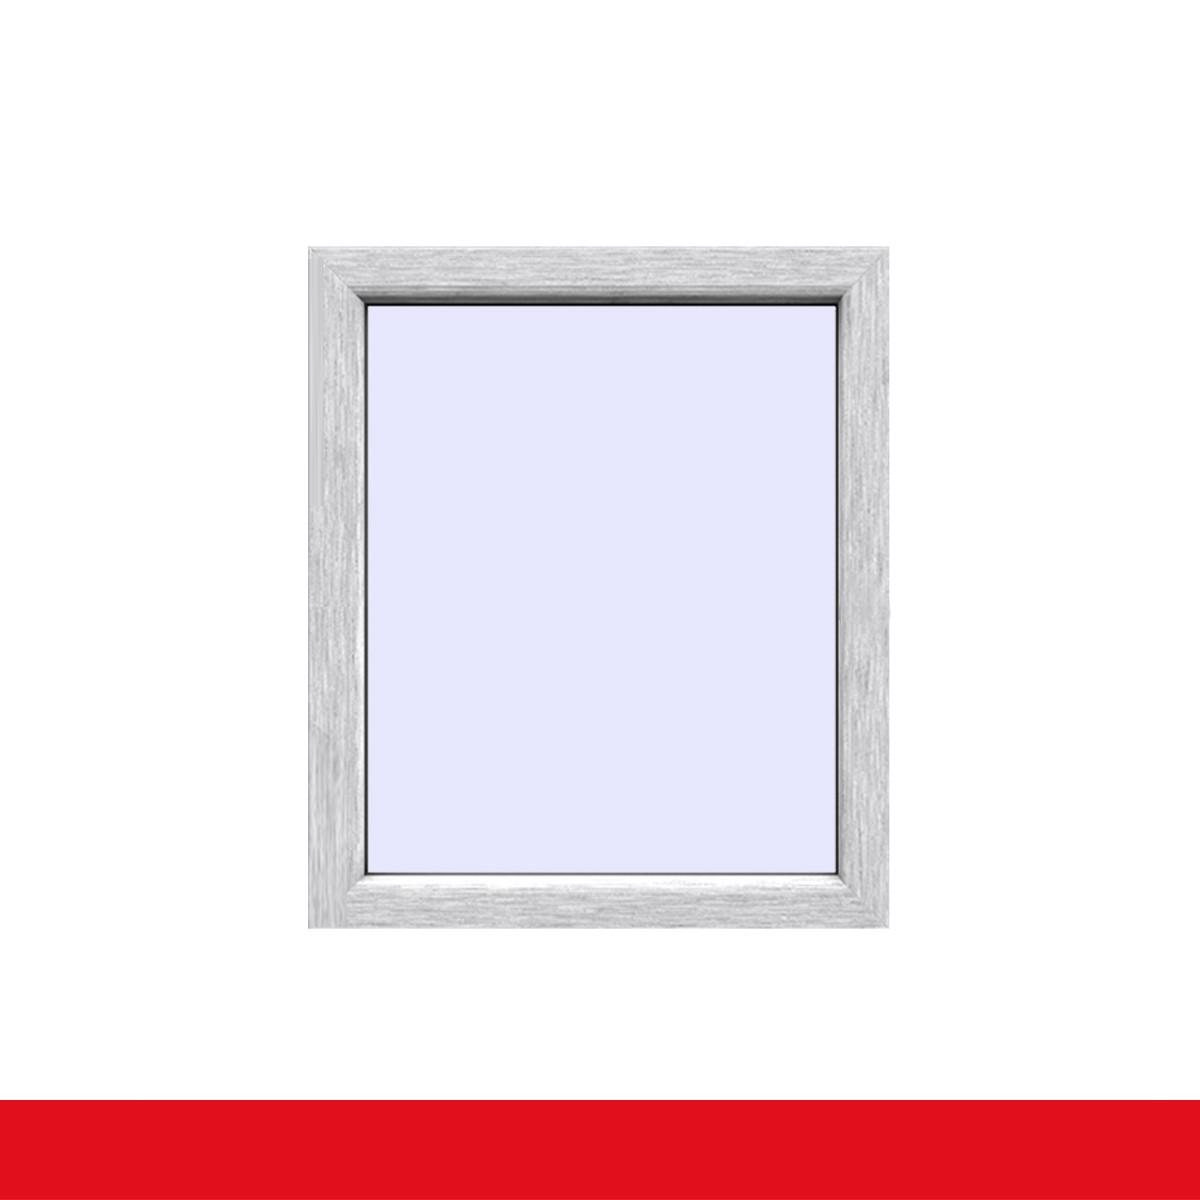 Festverglasung Fenster Aluminium Gebürstet beidseitig 1 flg. Fest im ...